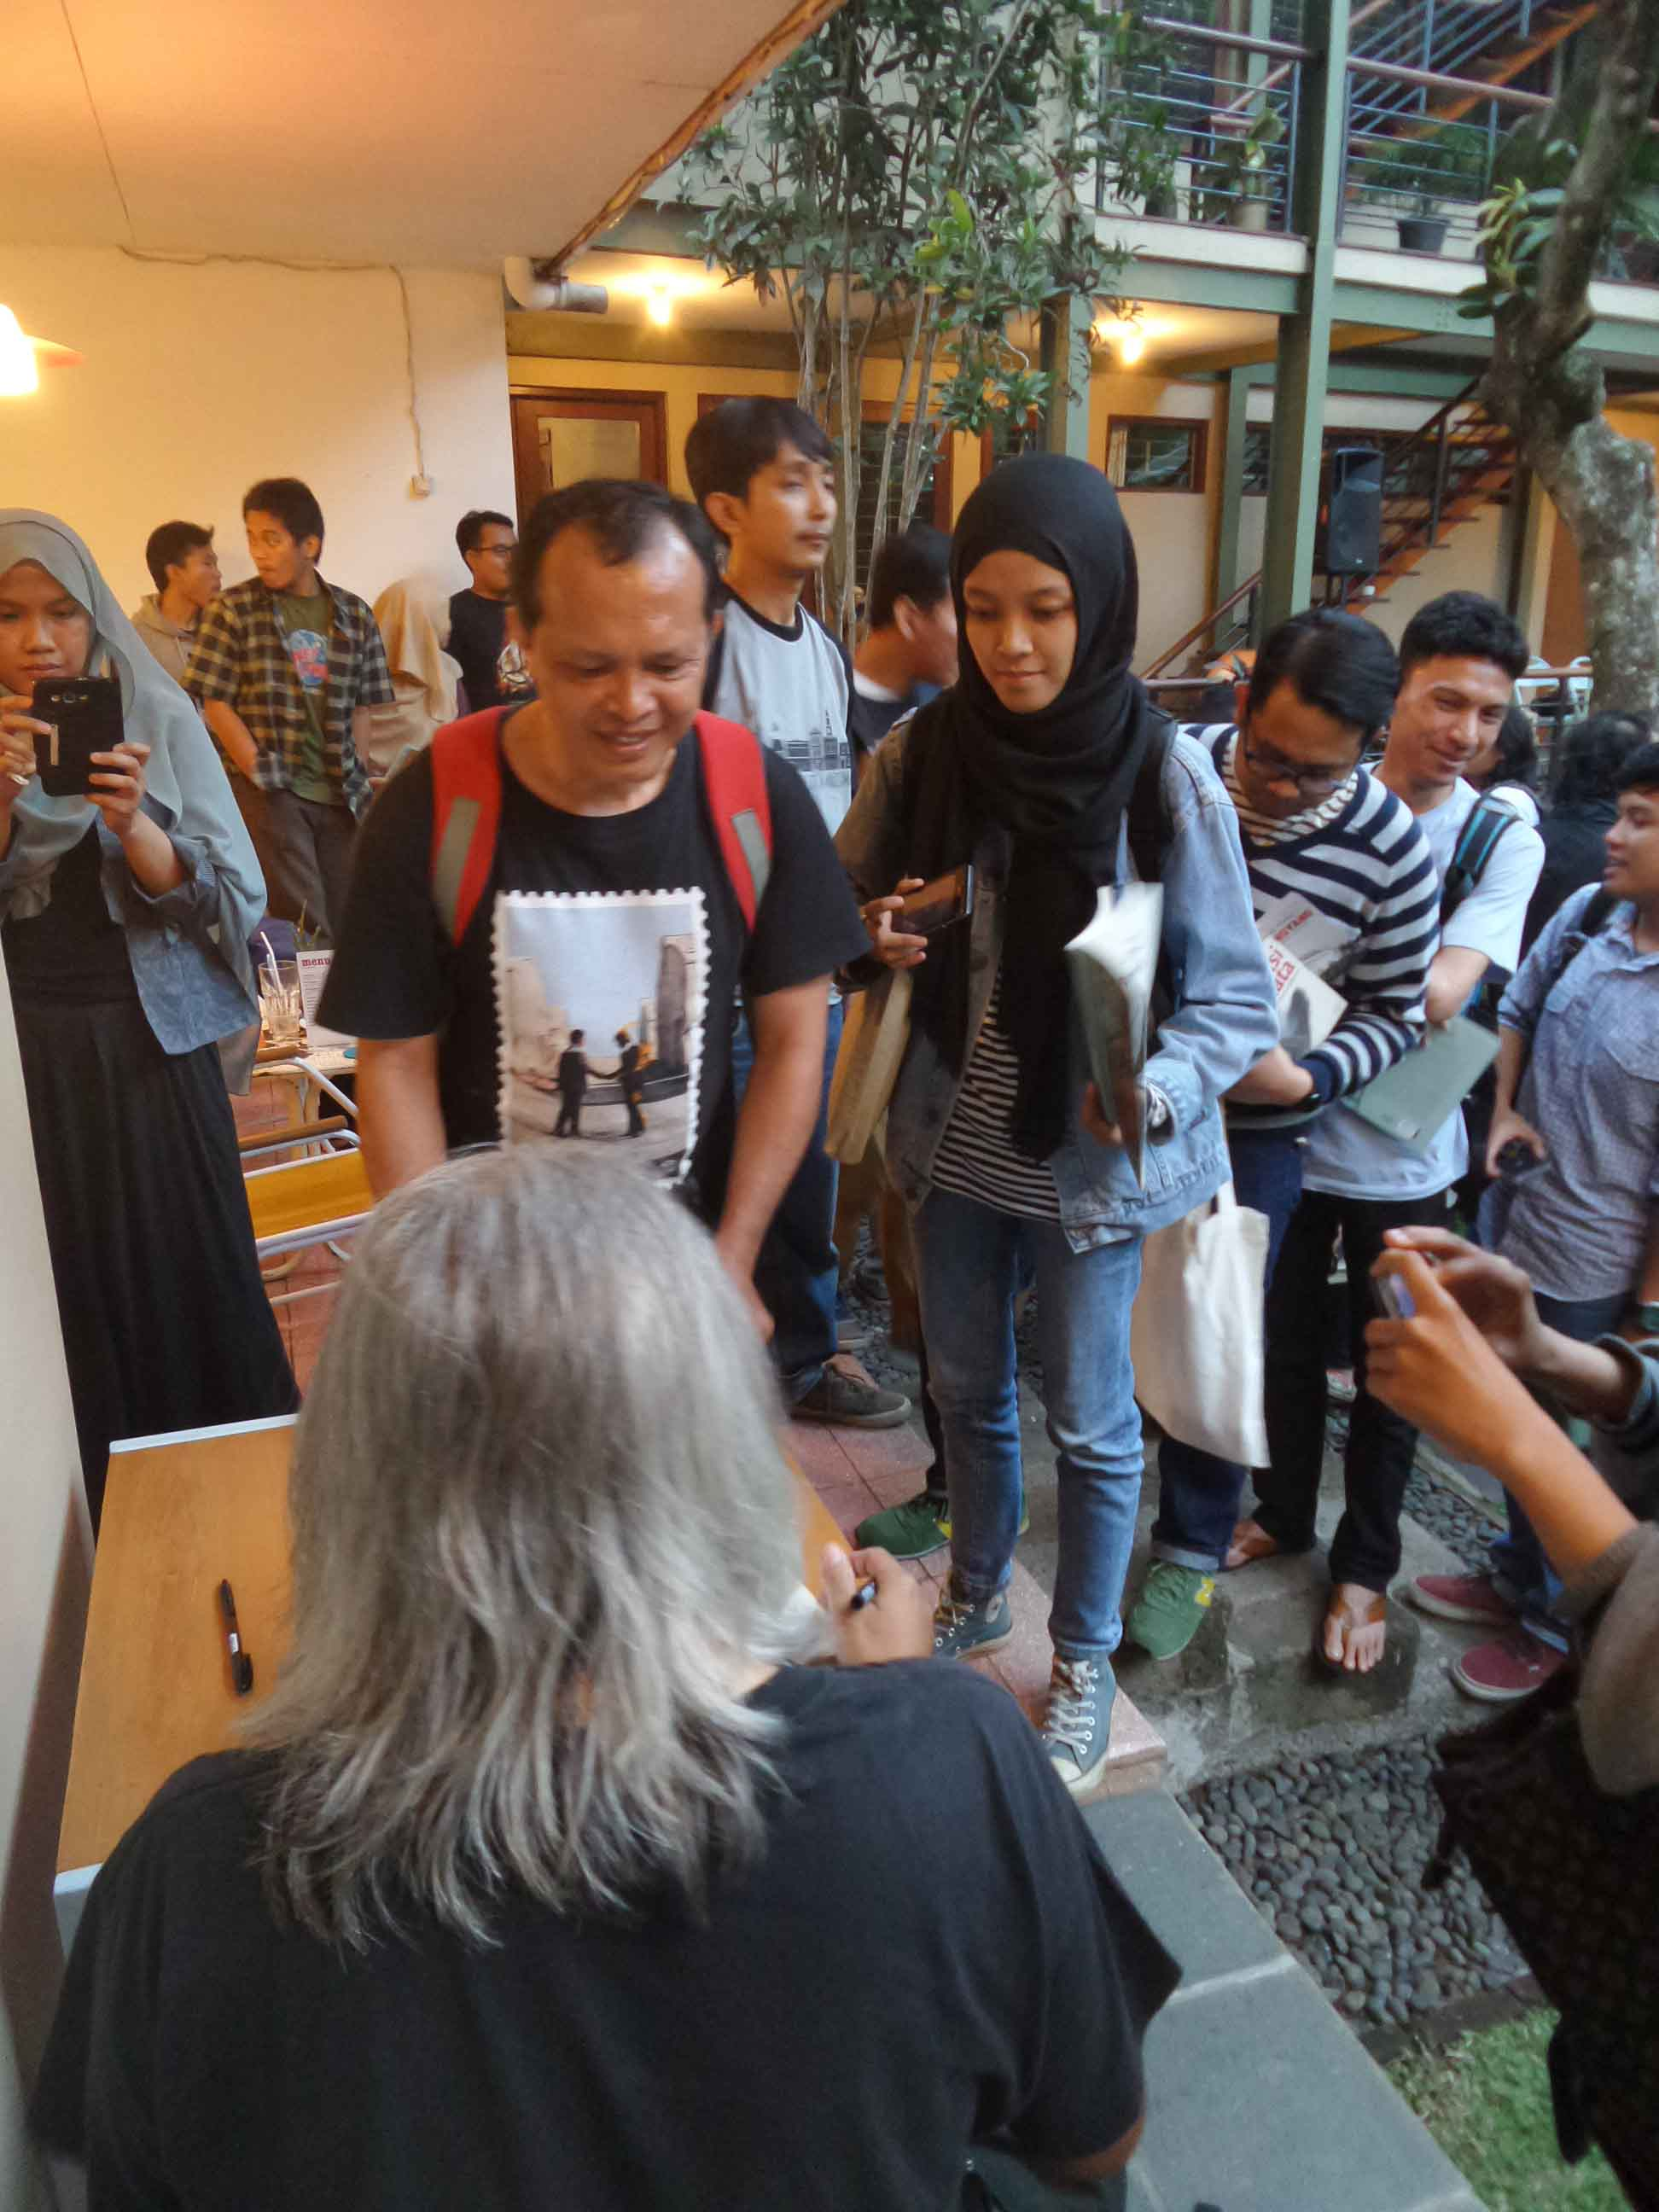 Book Signing Seno Gumira Ajidarma